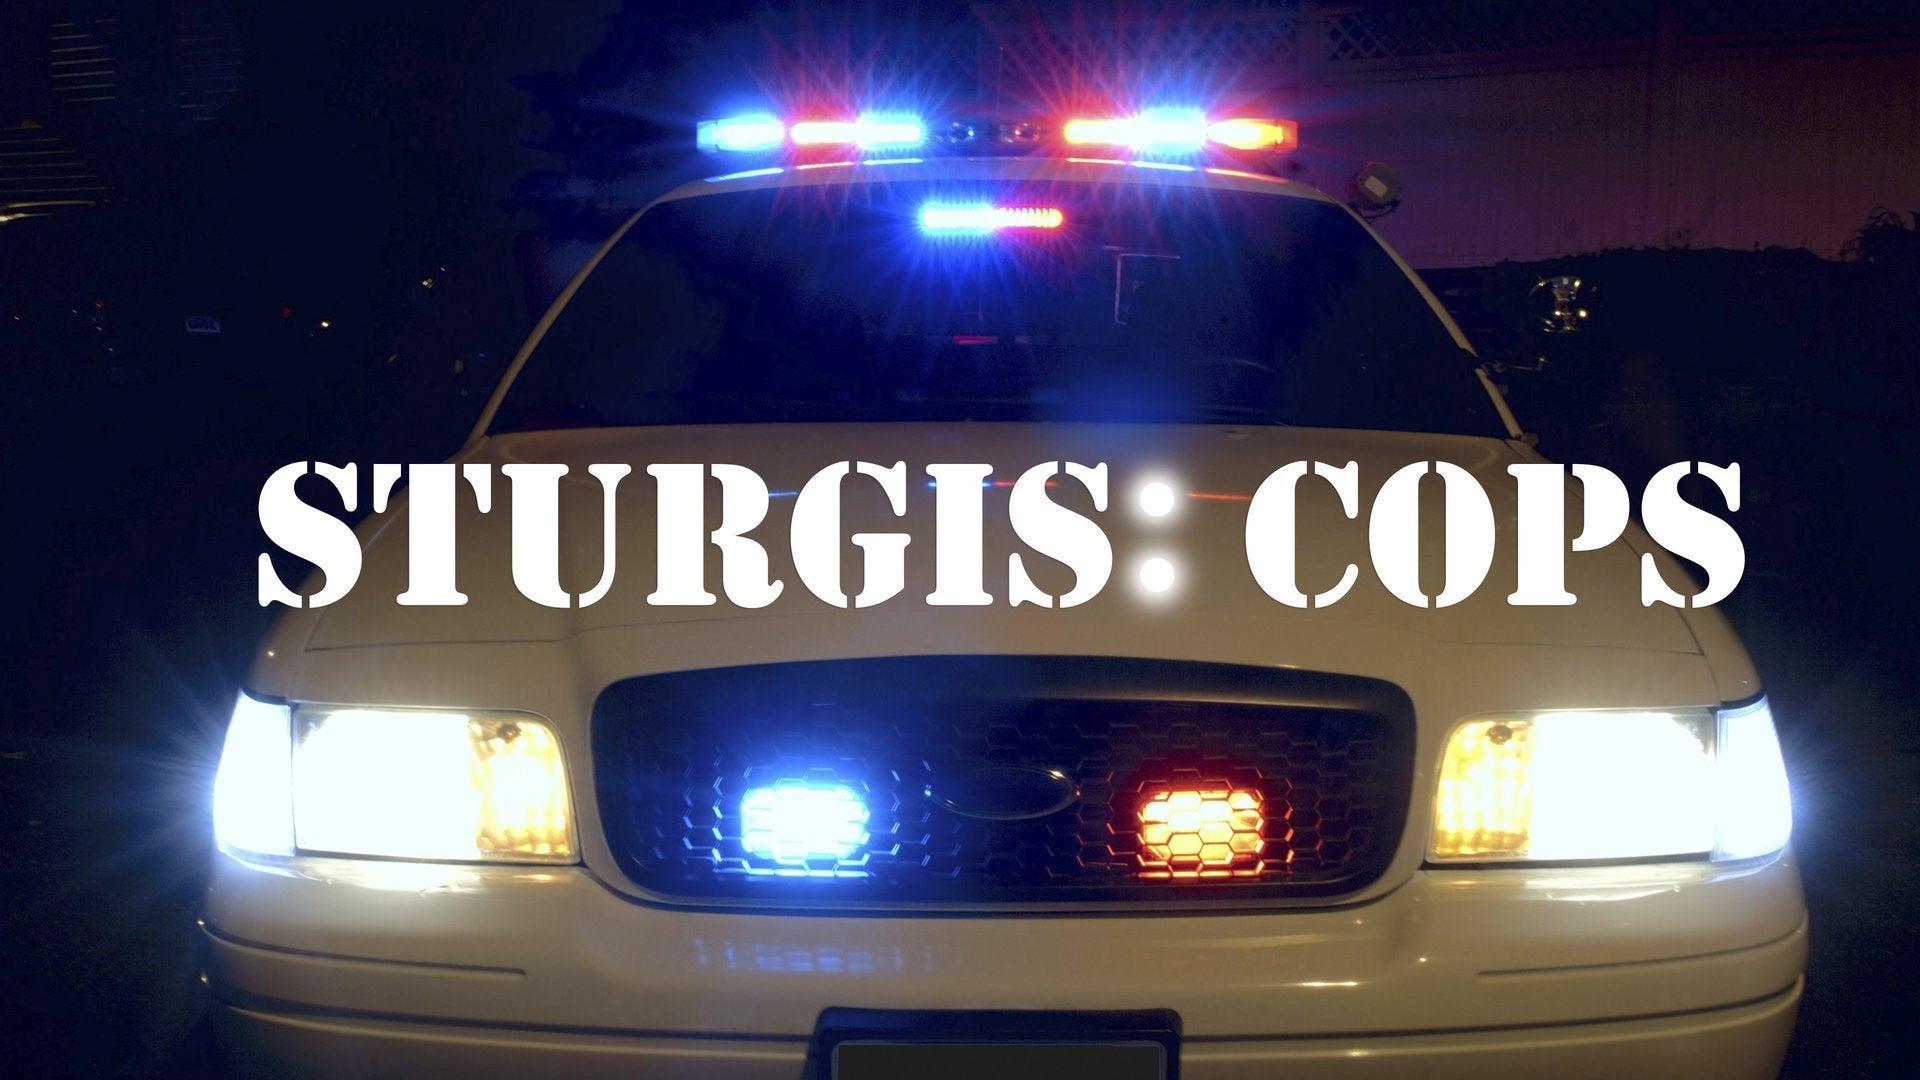 Sturgis: Cops